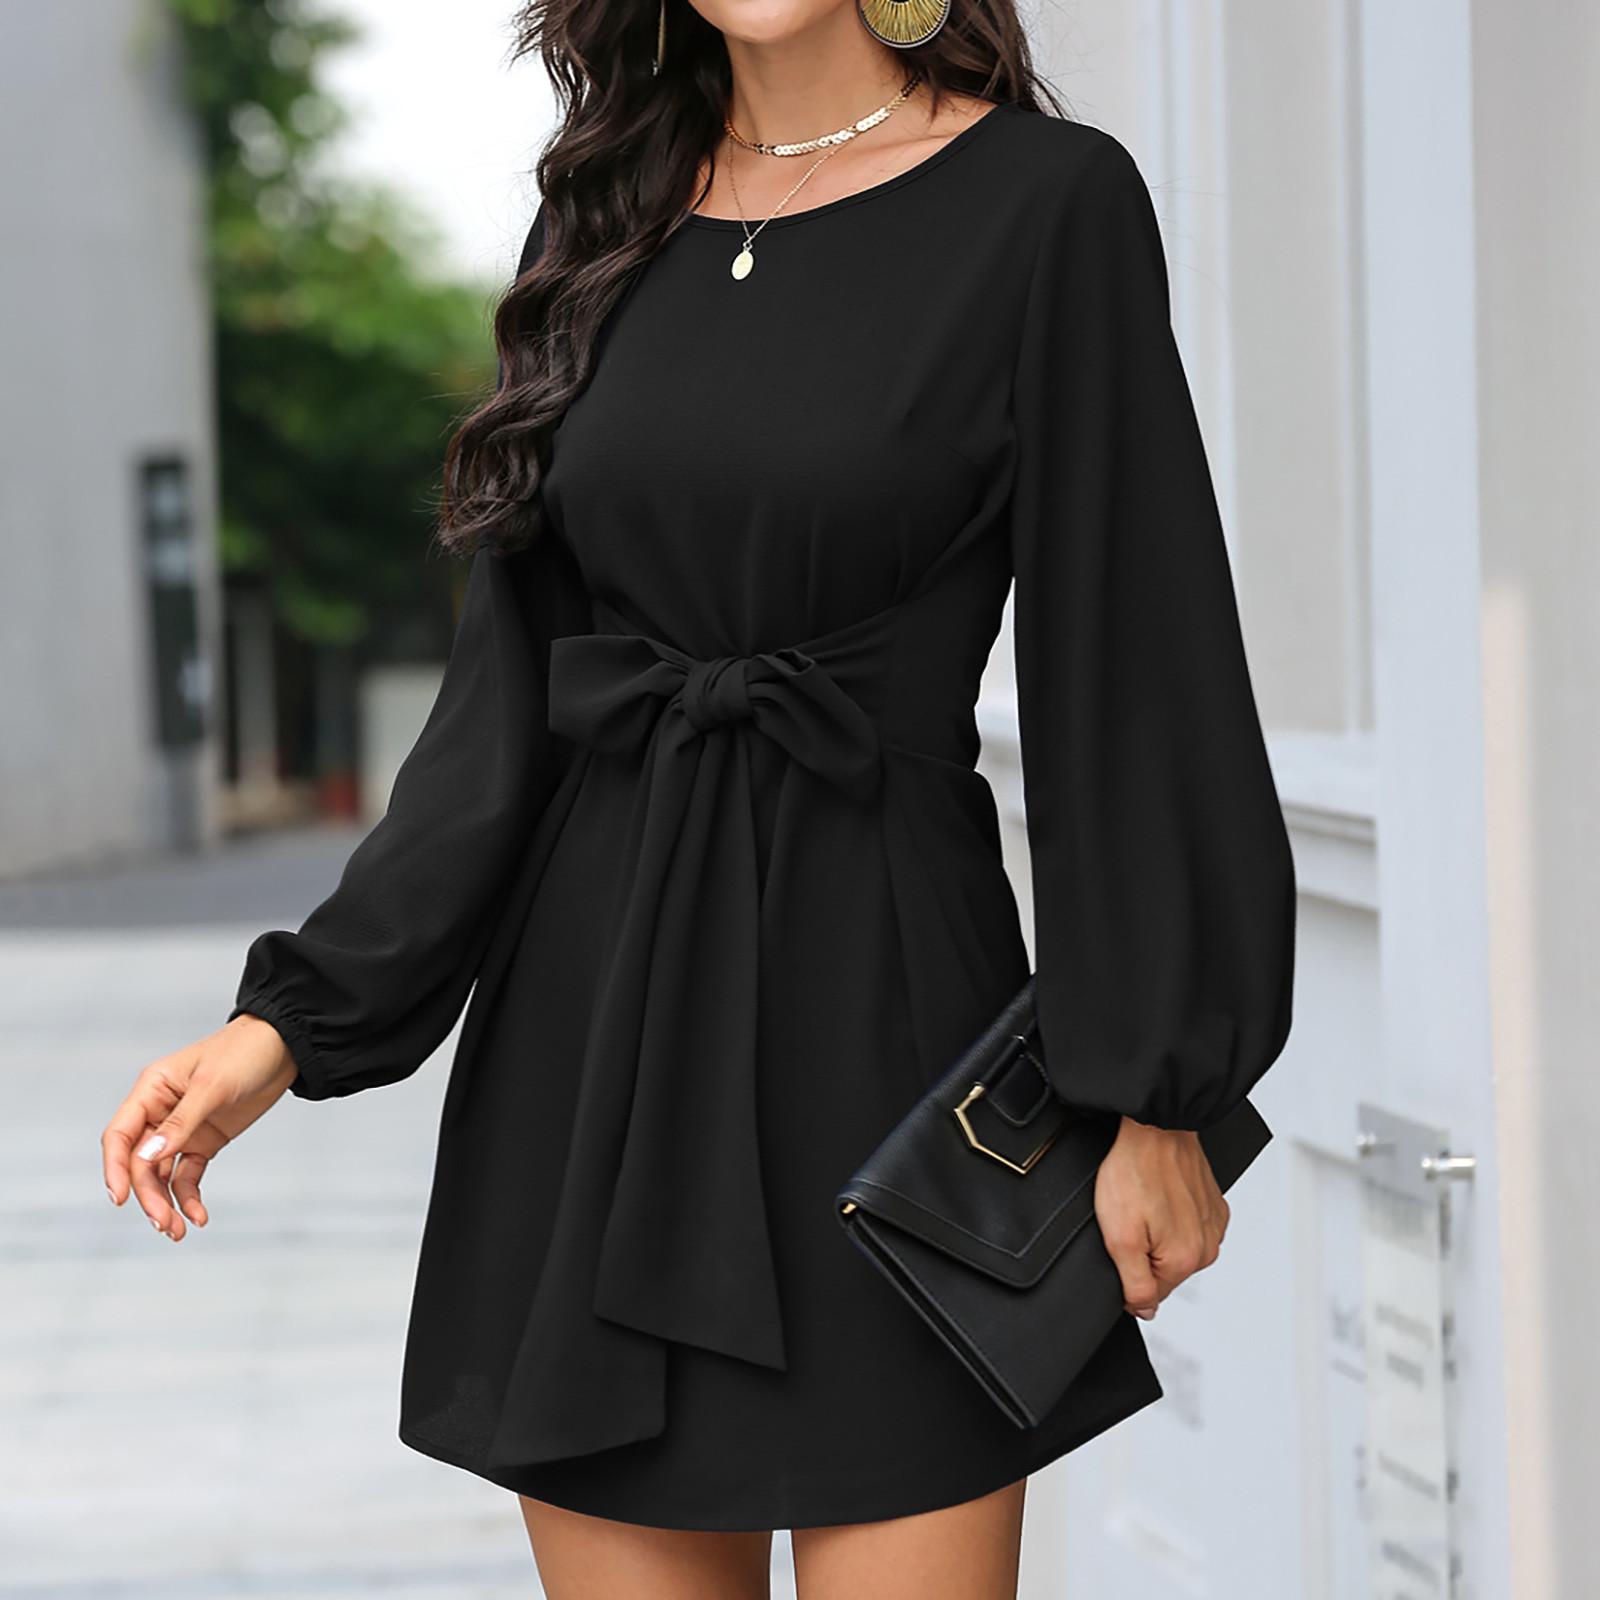 4# Women Slim Waist Dress Long Sleeve Solid Color Dress vestidos de fiesta dresses for women 2020 vestido Winter dresses